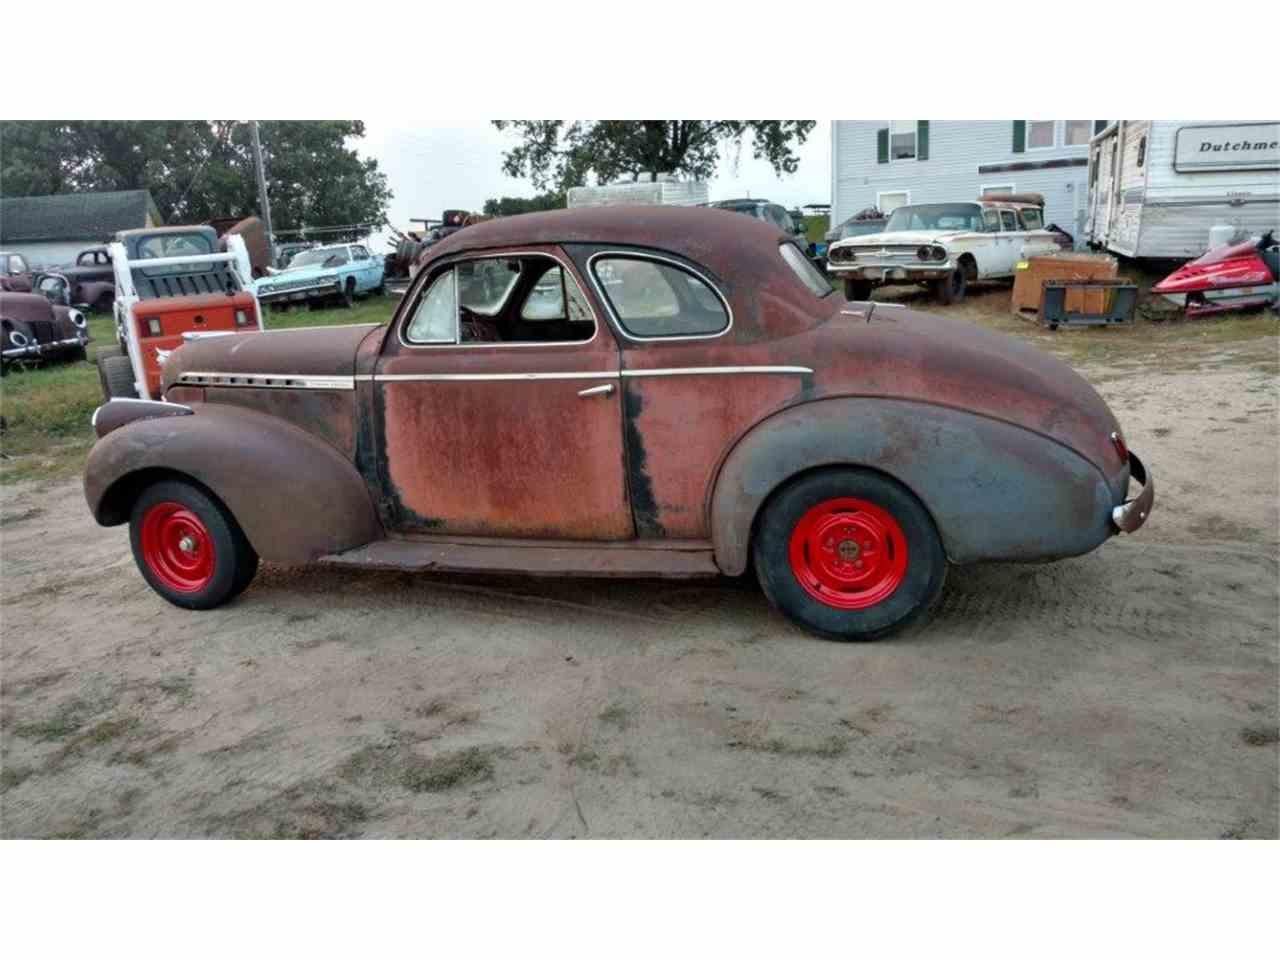 Dan S Old Cars Minnesota